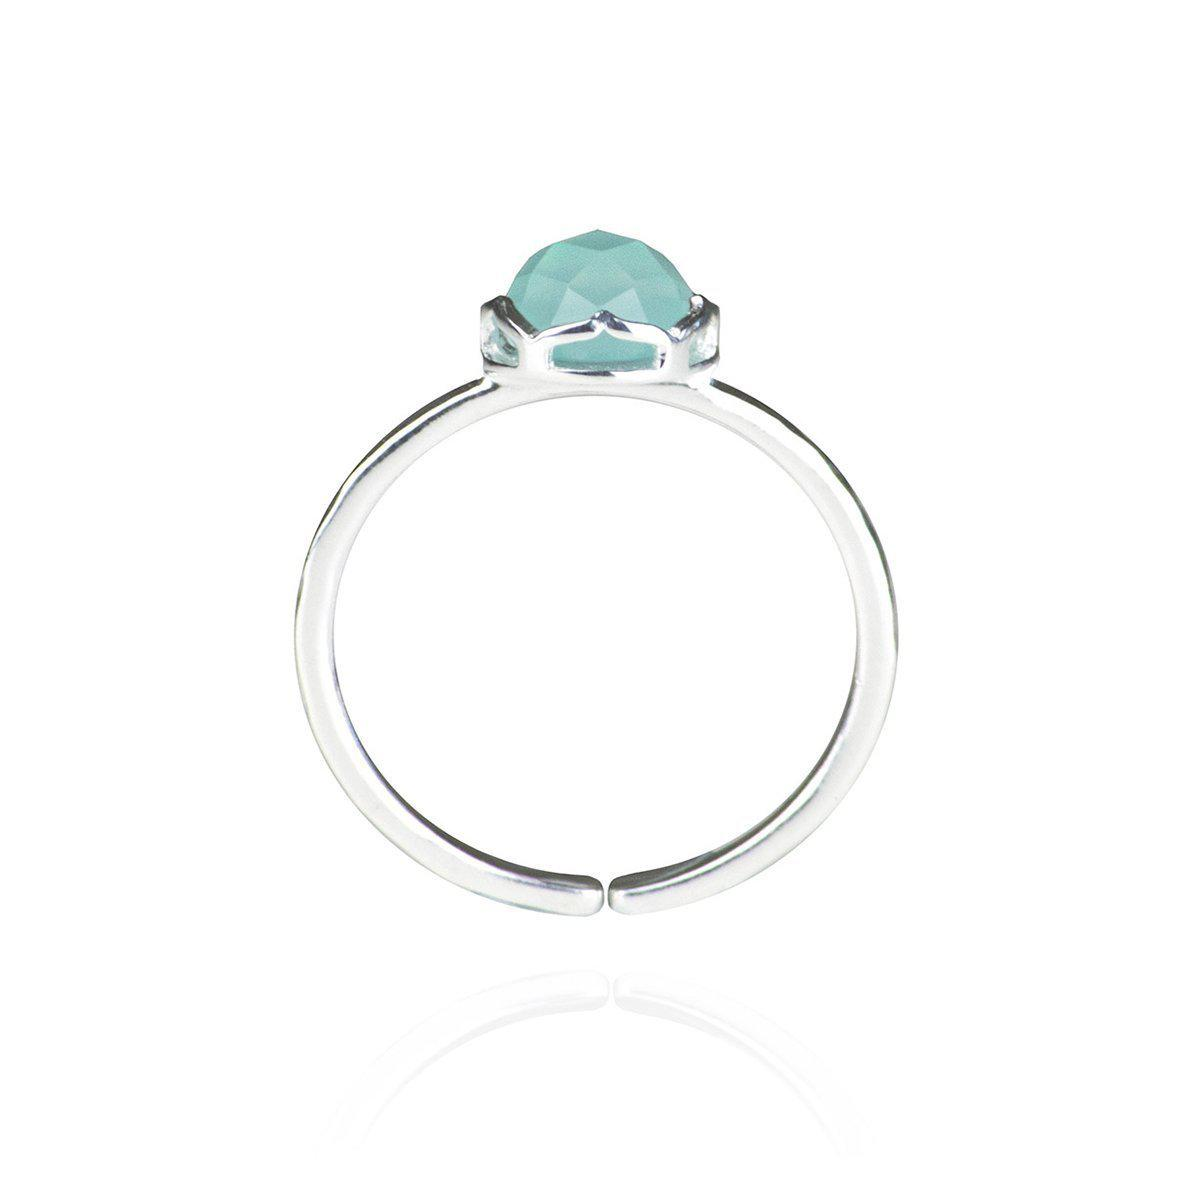 Zefyr Dosha Ring Sterling Silver With Aqua Chalcedony in Metallic